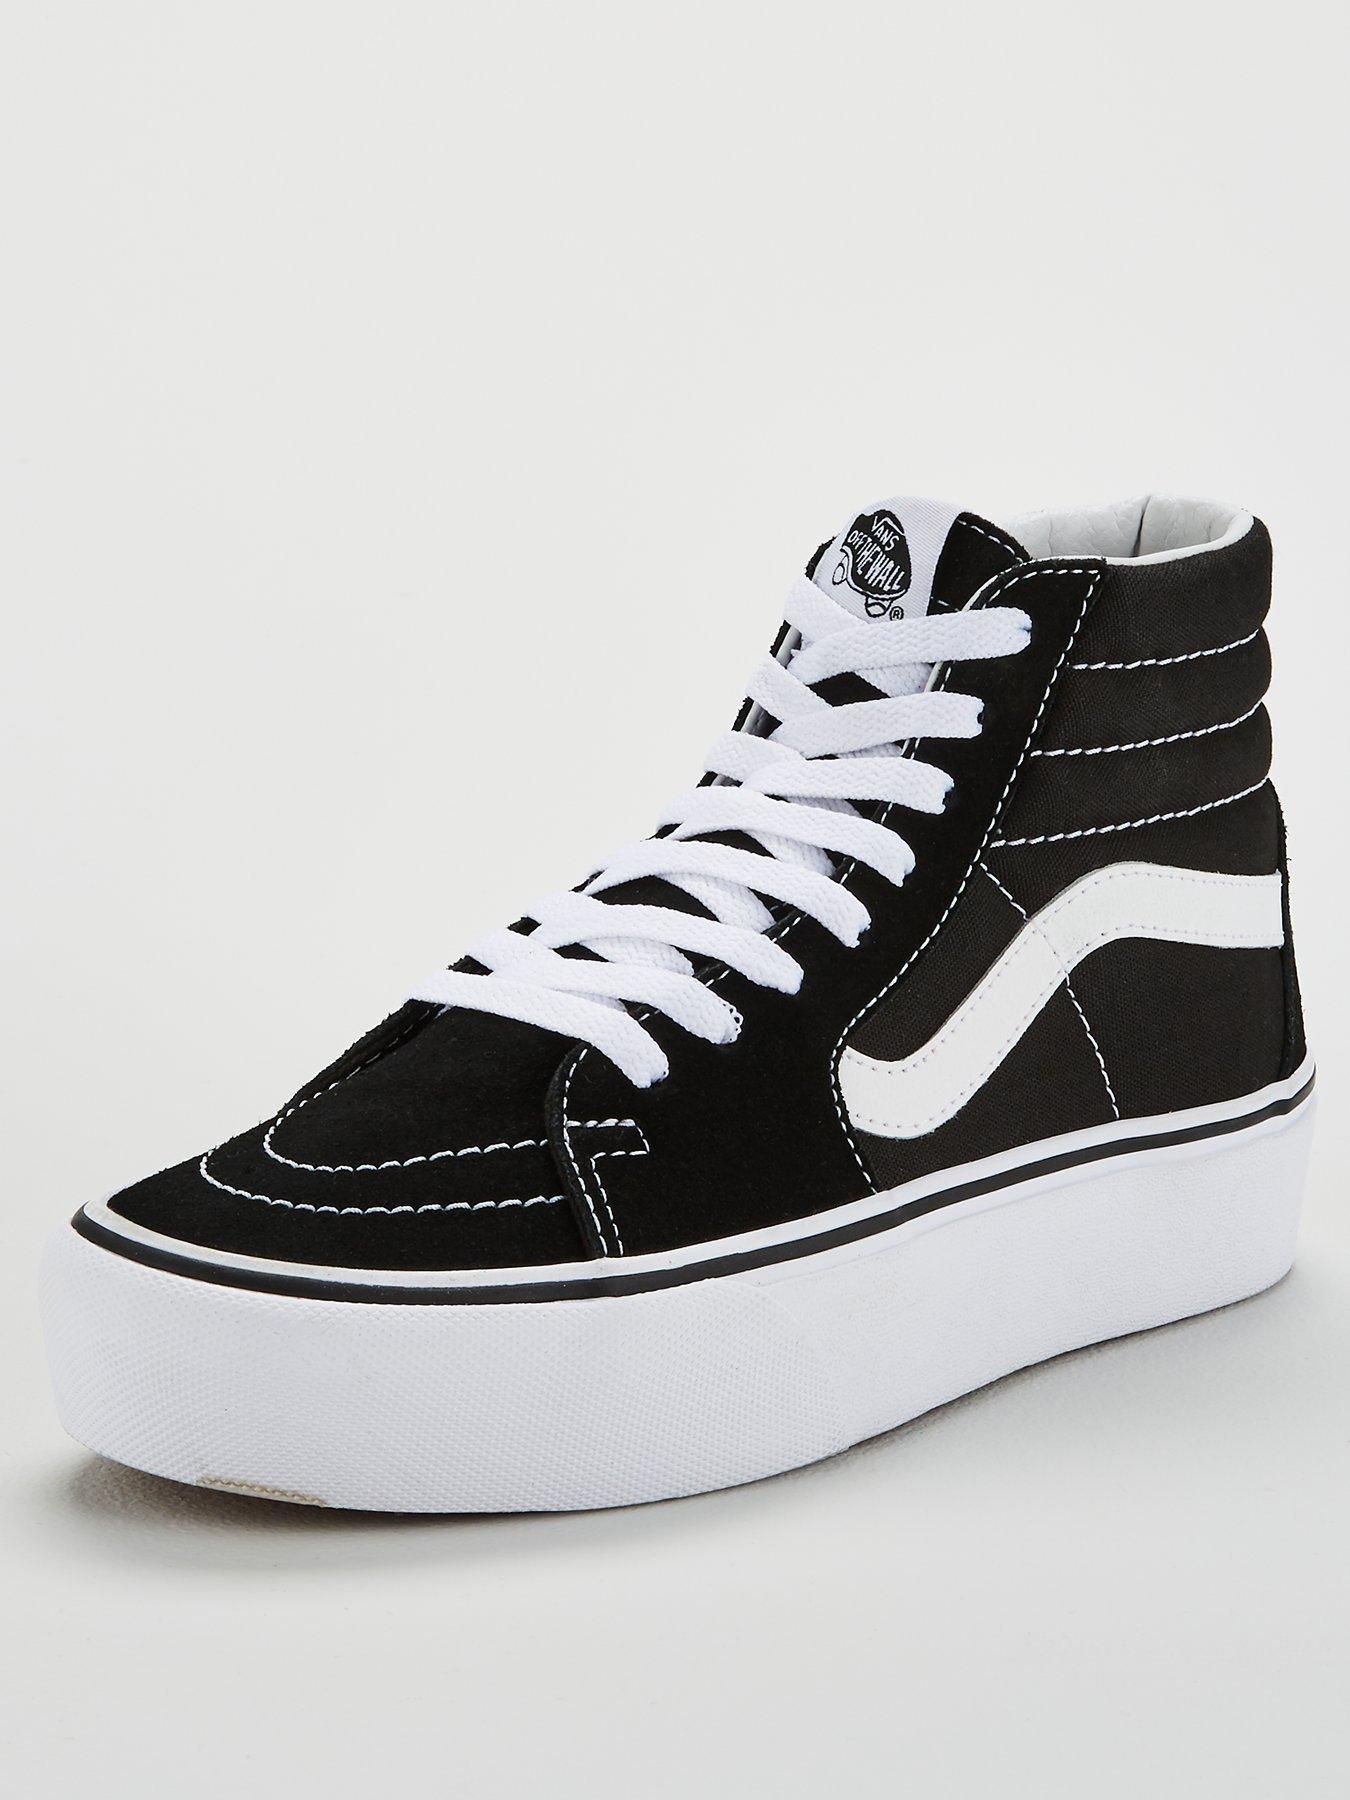 Vans Shoes \u0026 Clothing | Online Store